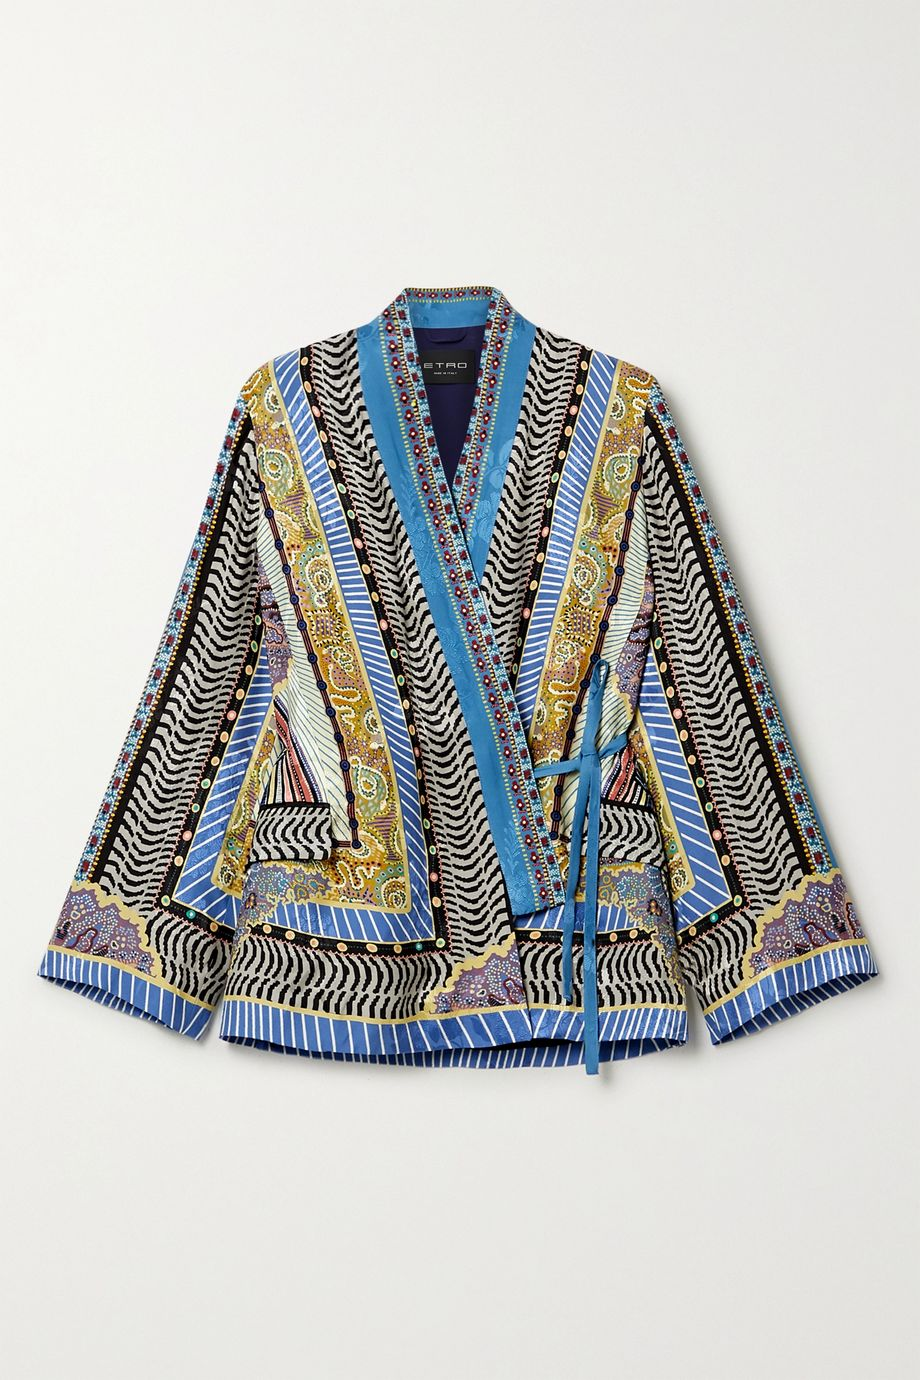 Etro Printed satin-jacquard wrap top